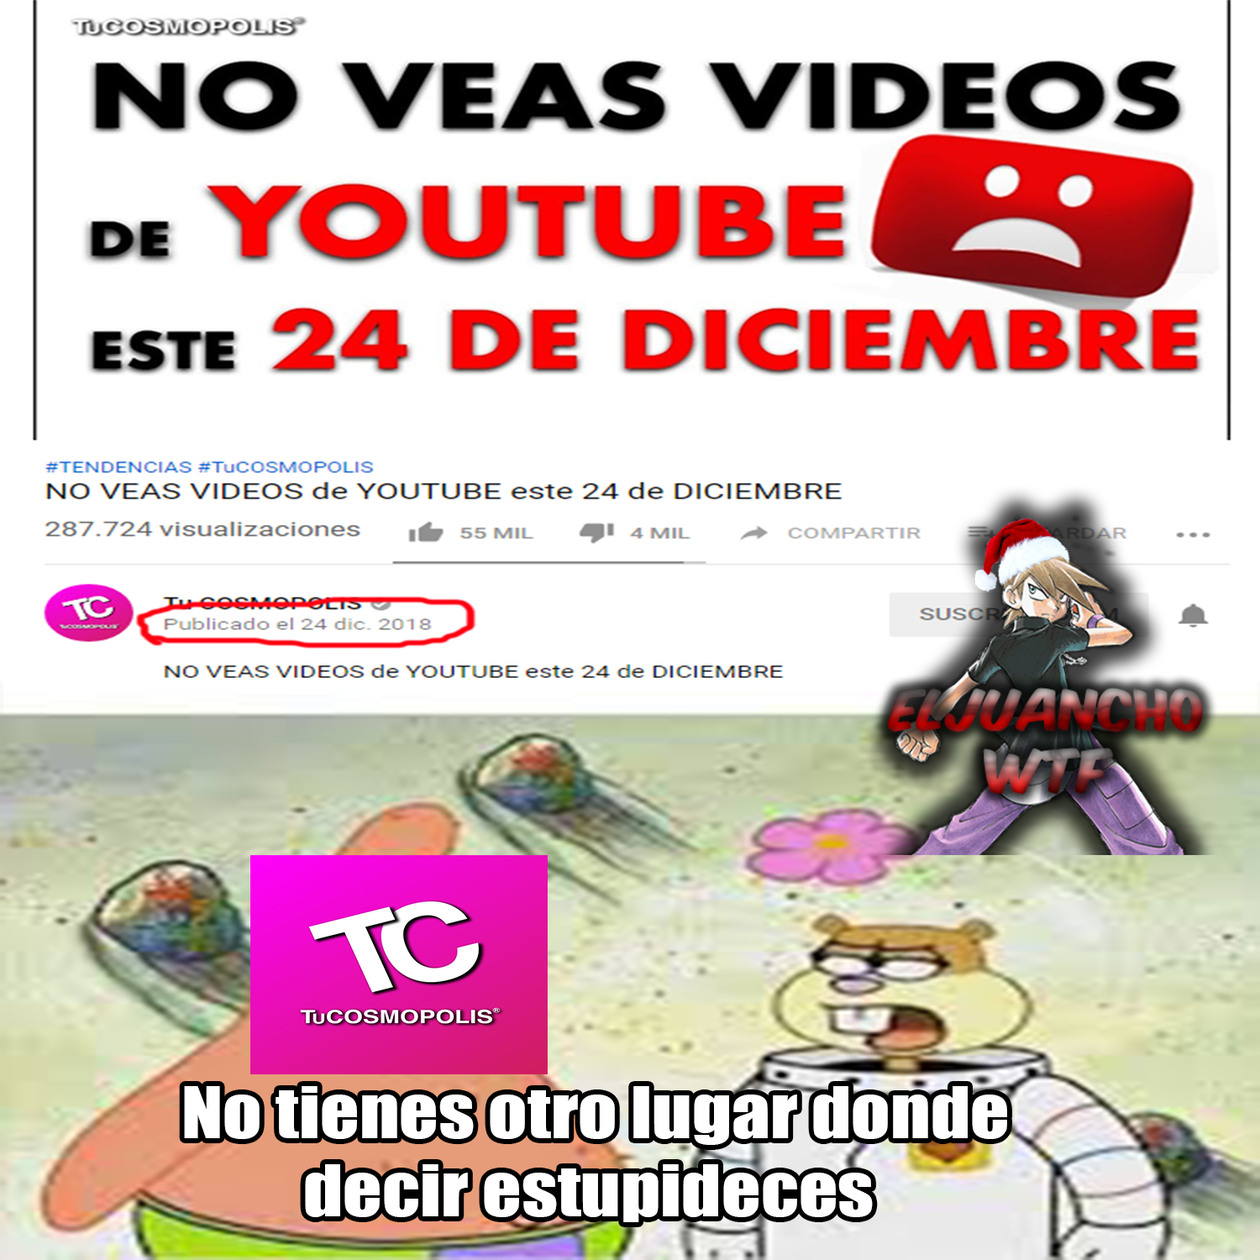 Tucosmopolis - meme